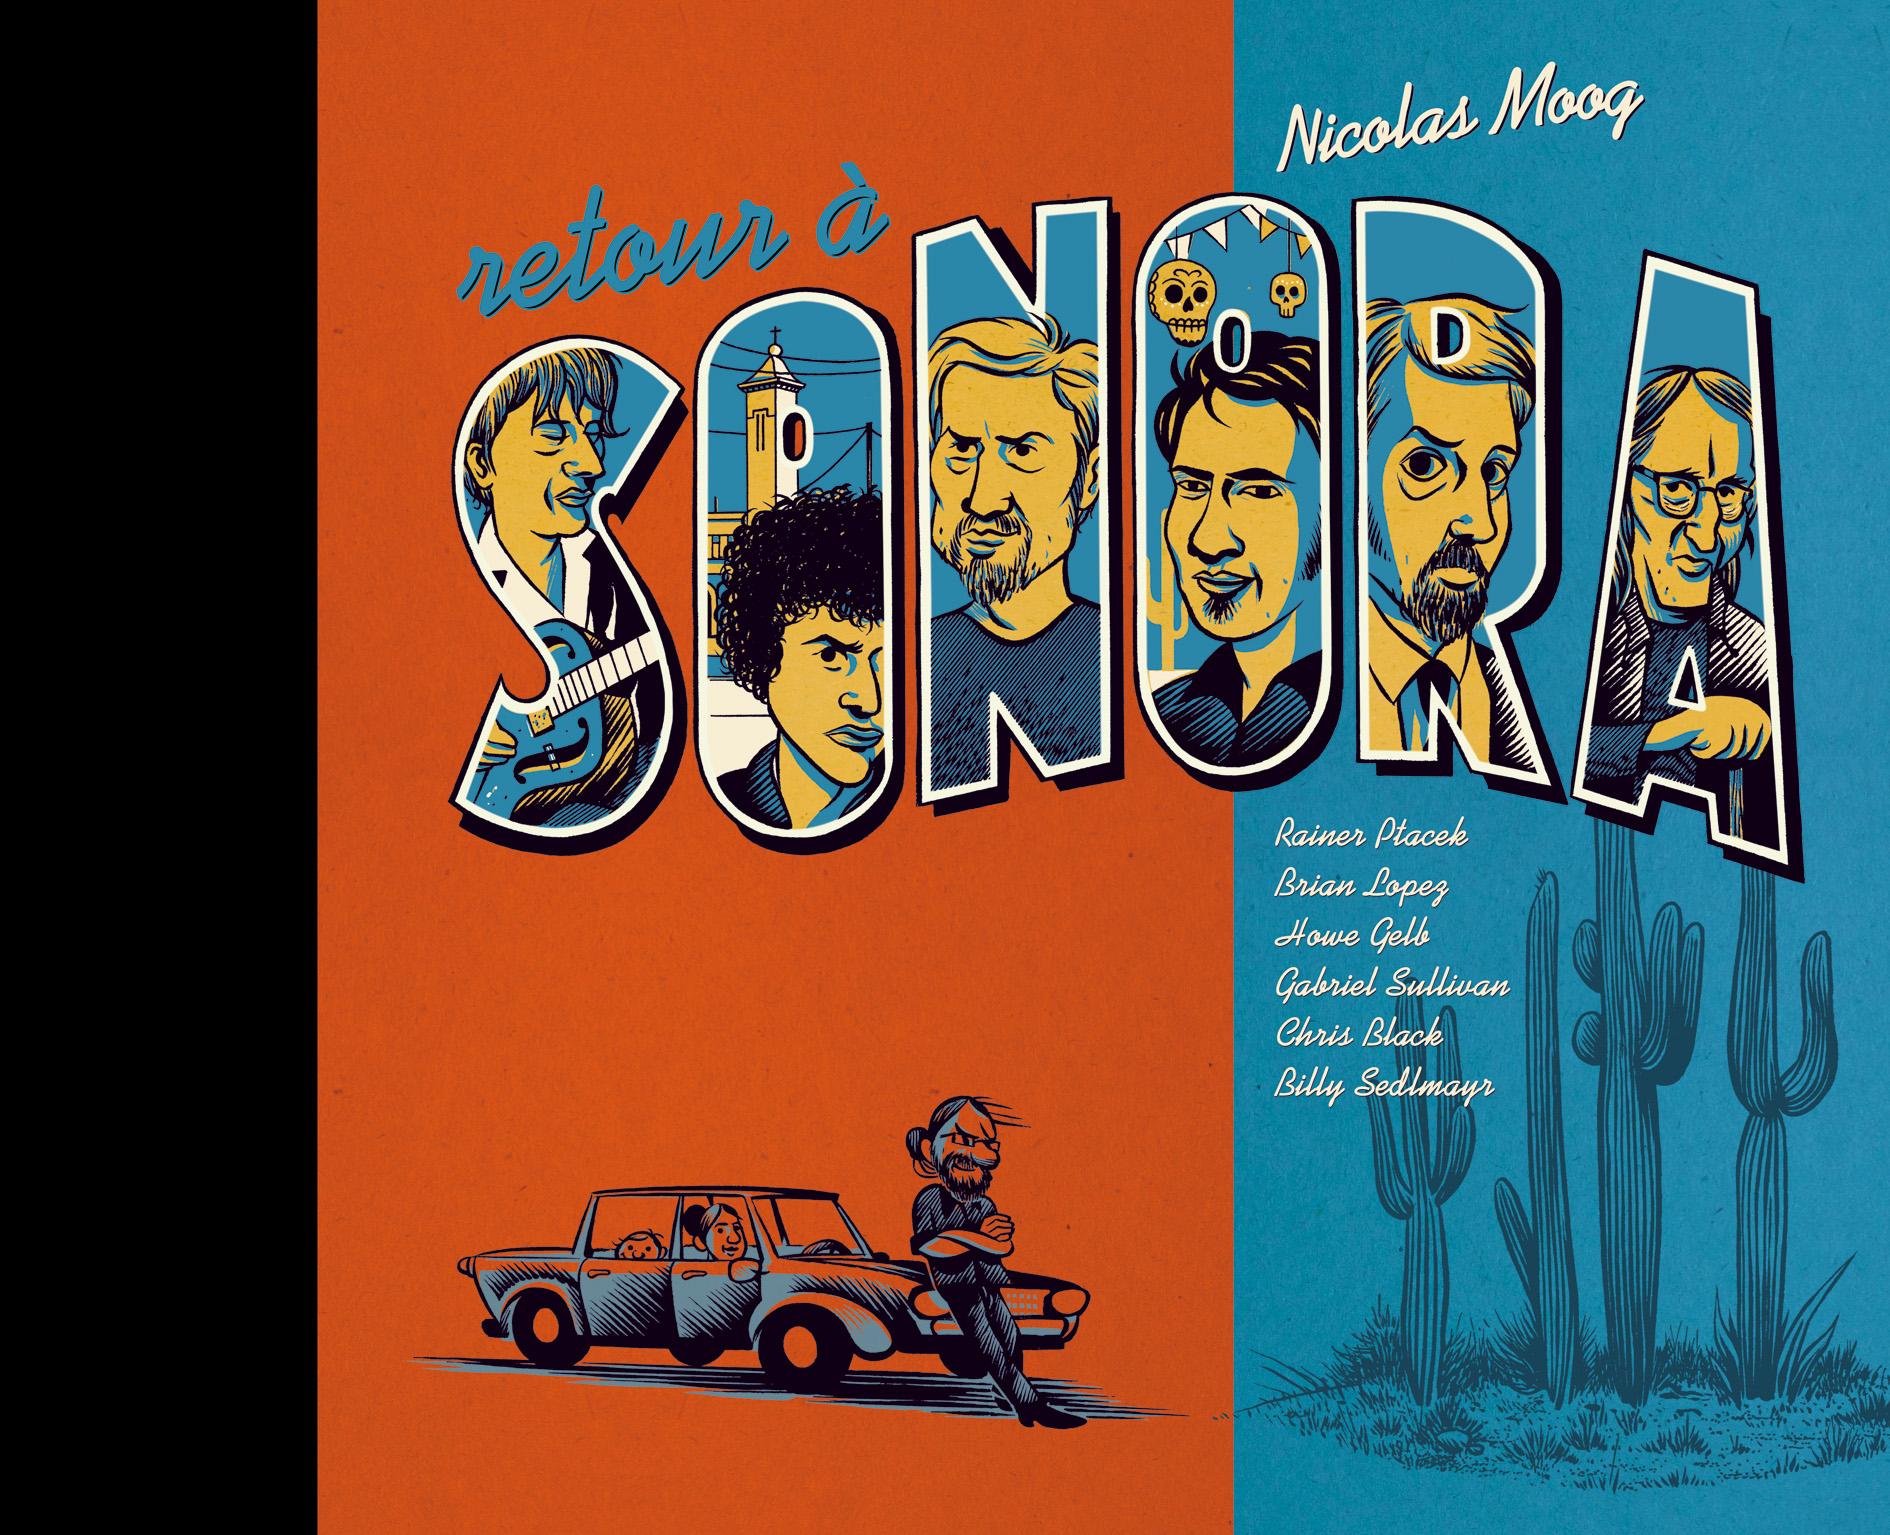 Retour à Sonora Nicolas Moog Six Pieds sous terre